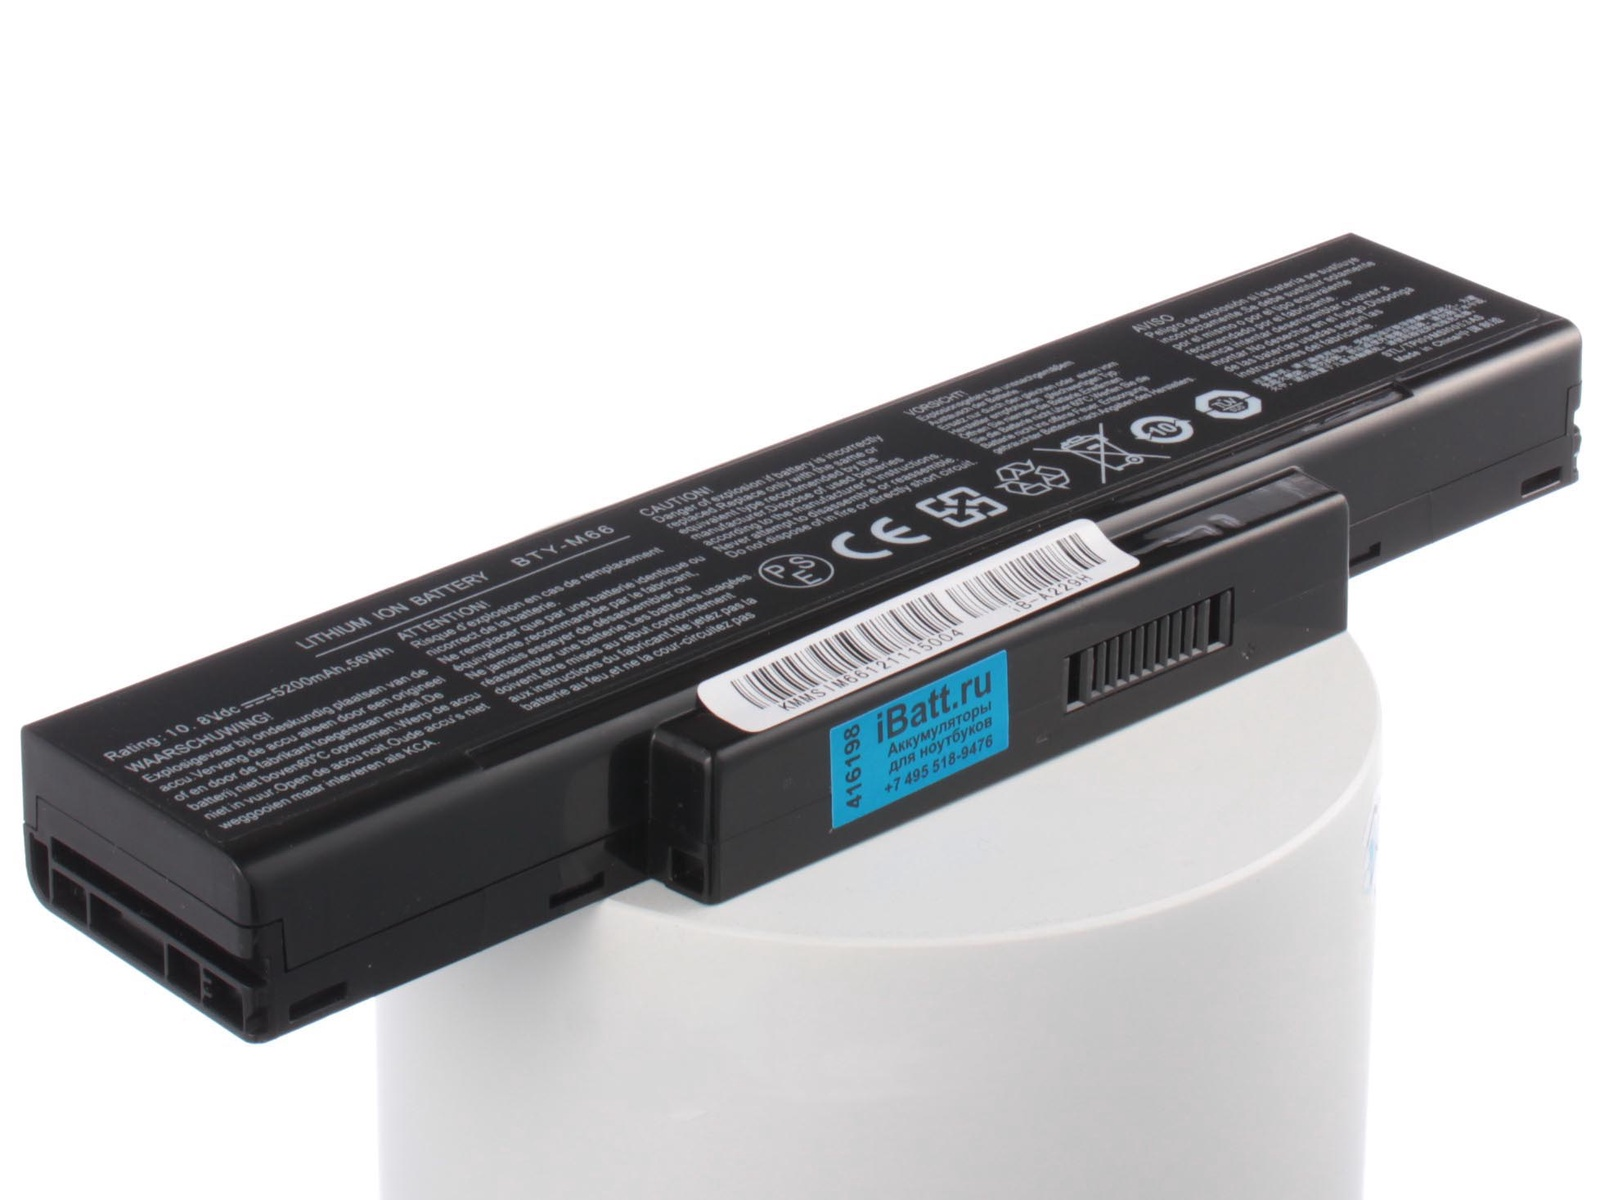 Аккумулятор для ноутбука iBatt для MSI Megabook M670, Megabook EX610, Megabook M677, Megabook GX600, Megabook M662, Megabook VR601, EX465, MS-1722, EX630, GT725, VR602, Megabook GX620, Megabook GX640, GT627, Megabook EX600